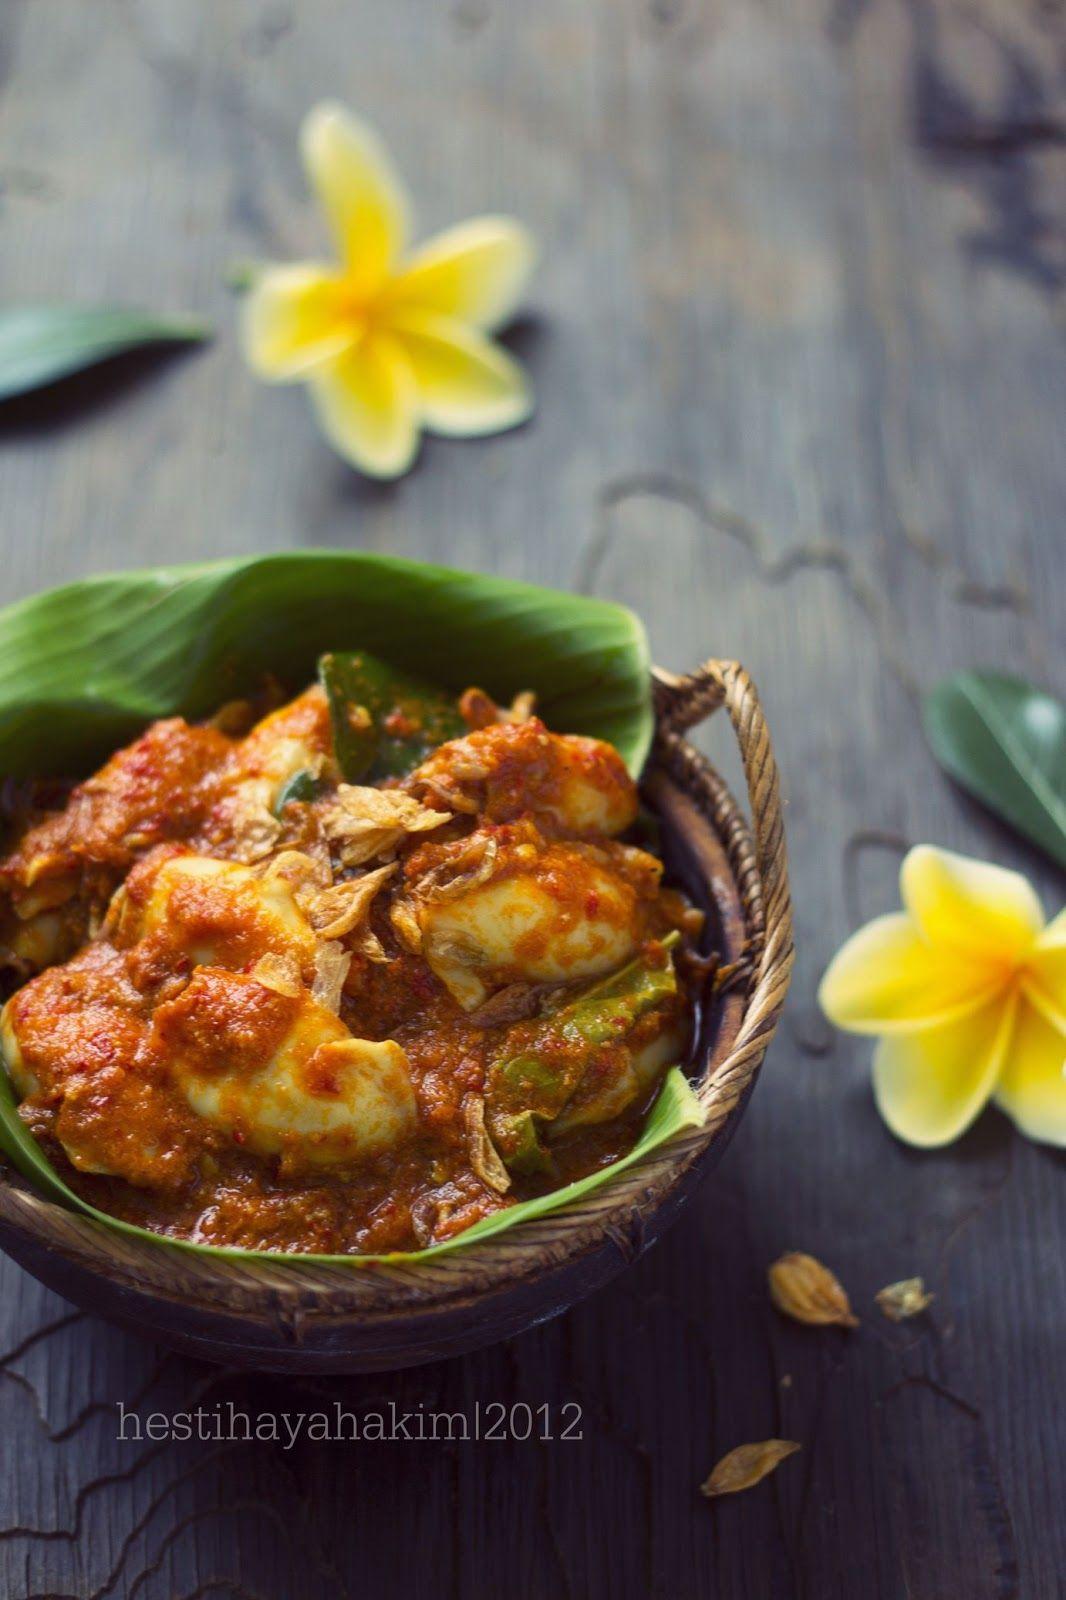 Kenus Mebase Bali Adalah Salah Satu Olahan Cumi Khas Pulau Bali Rasanya Mirip Gulai Tapi Minus Santan Kalau Dul Resep Masakan Indonesia Masakan Resep Masakan